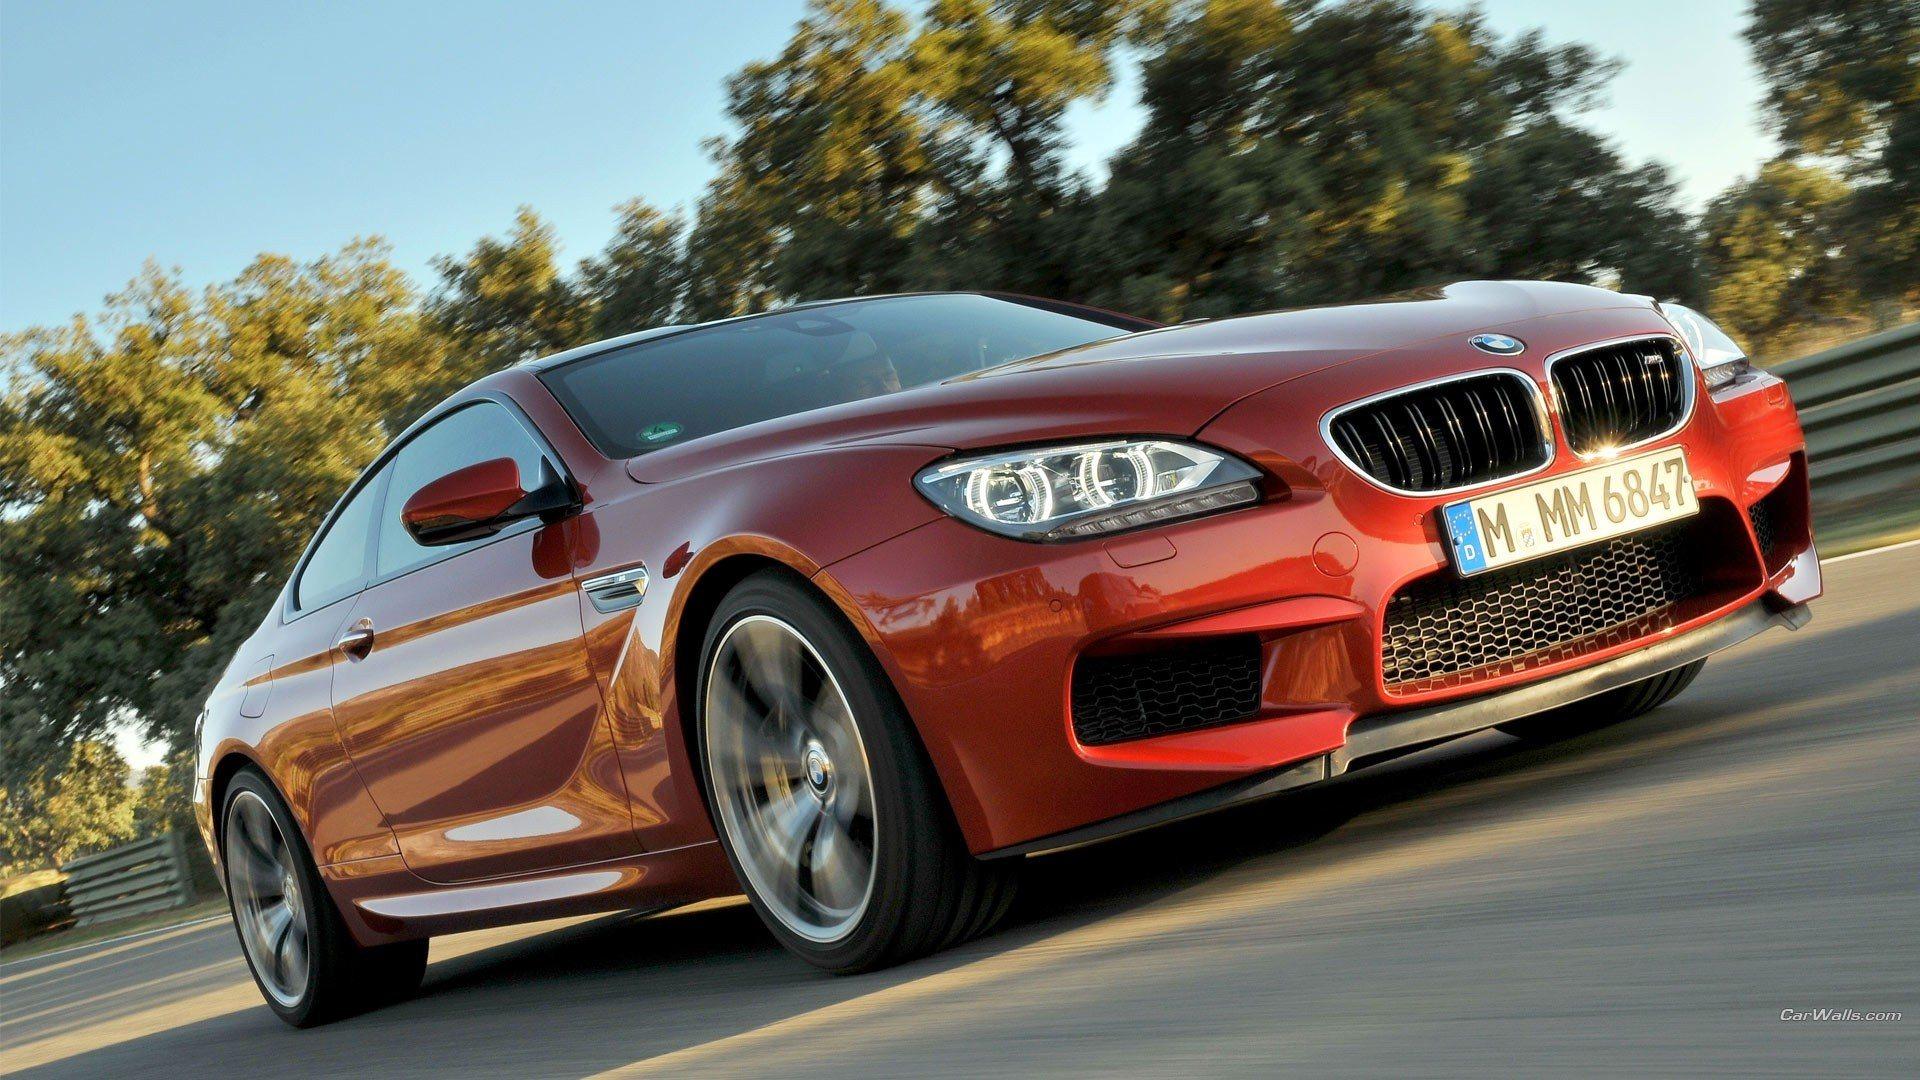 BMW M6 Sports Cars